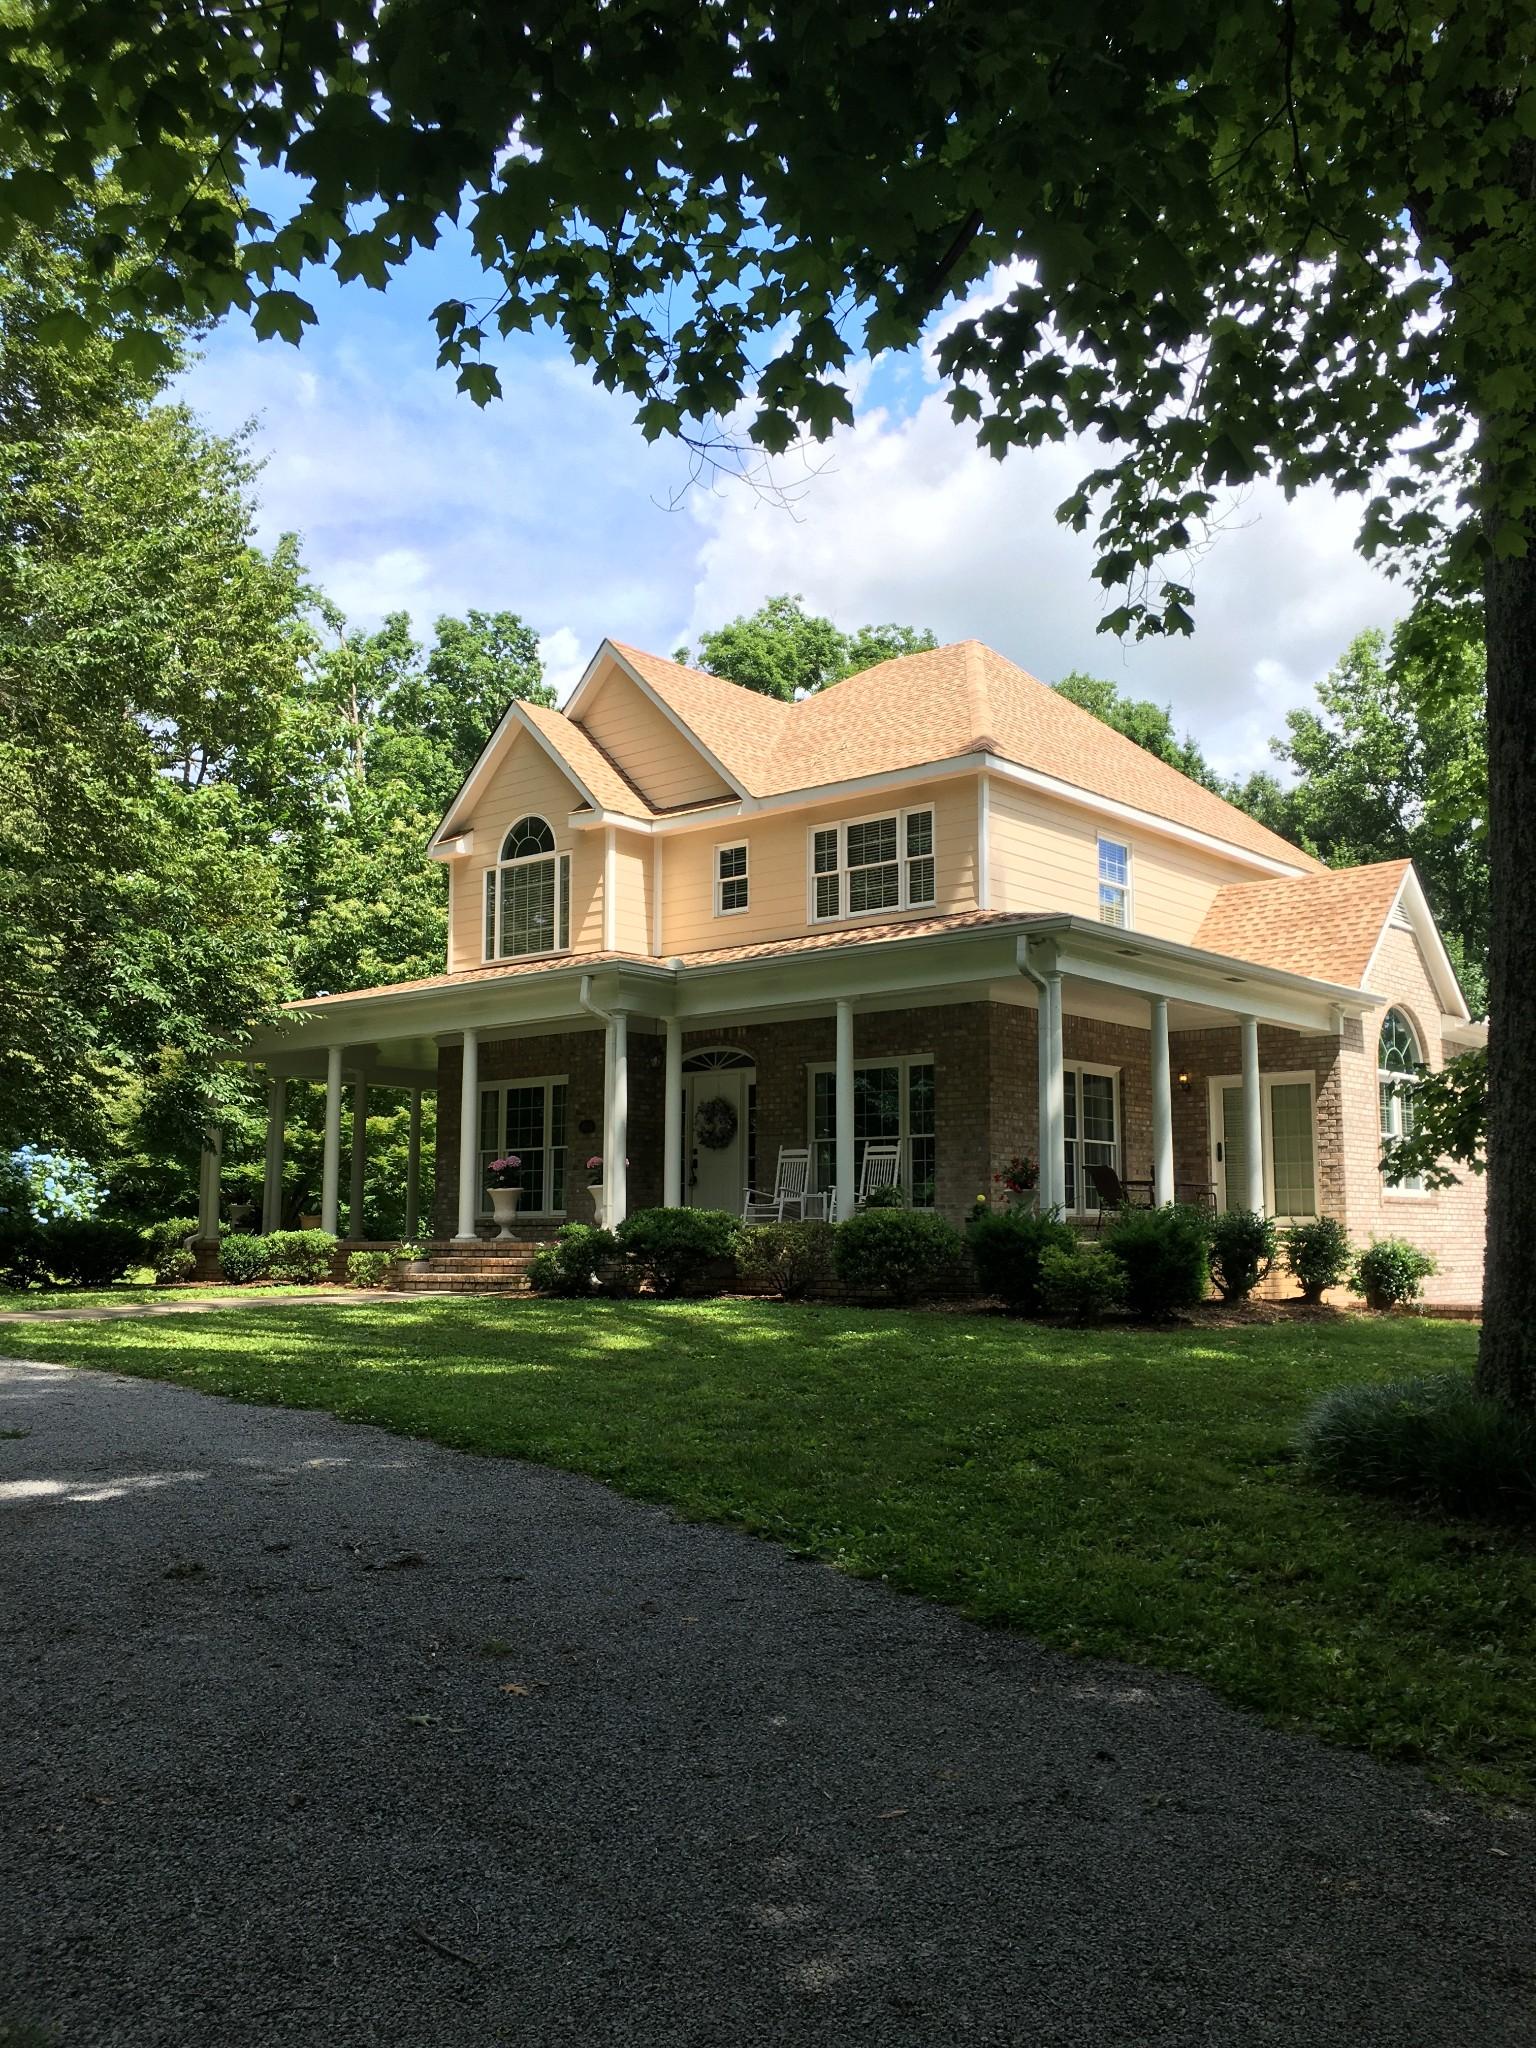 894 Ridgeview Ln Property Photo 1